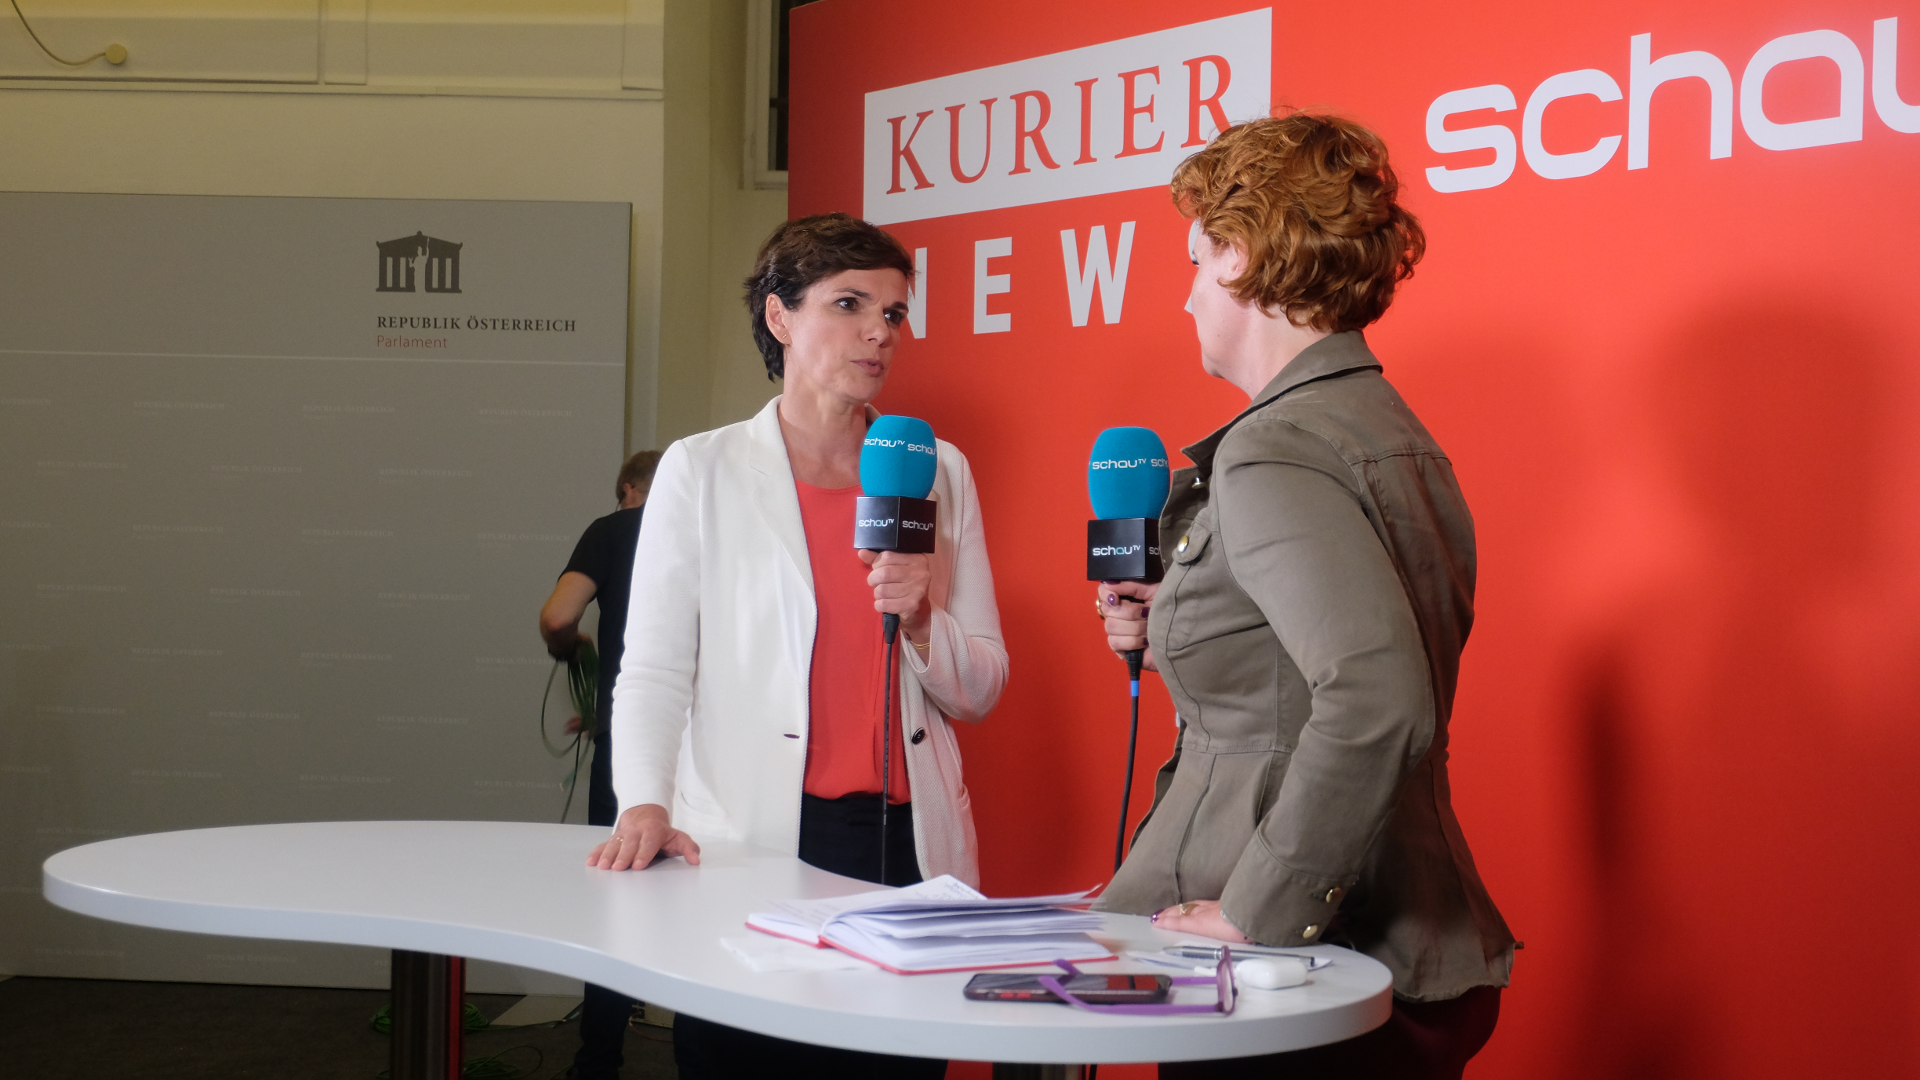 Joy Pamela Rendi-Wagner-SPÖ-Nationalratswahl 2019-Sebastian Kurz-Schau TV-Kurier